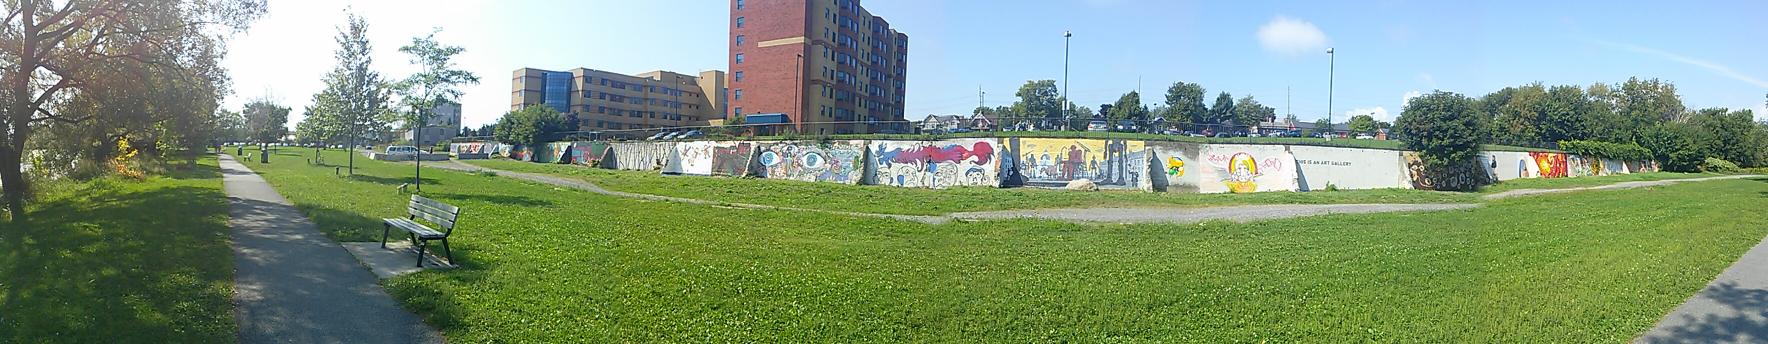 wallpanoramic2